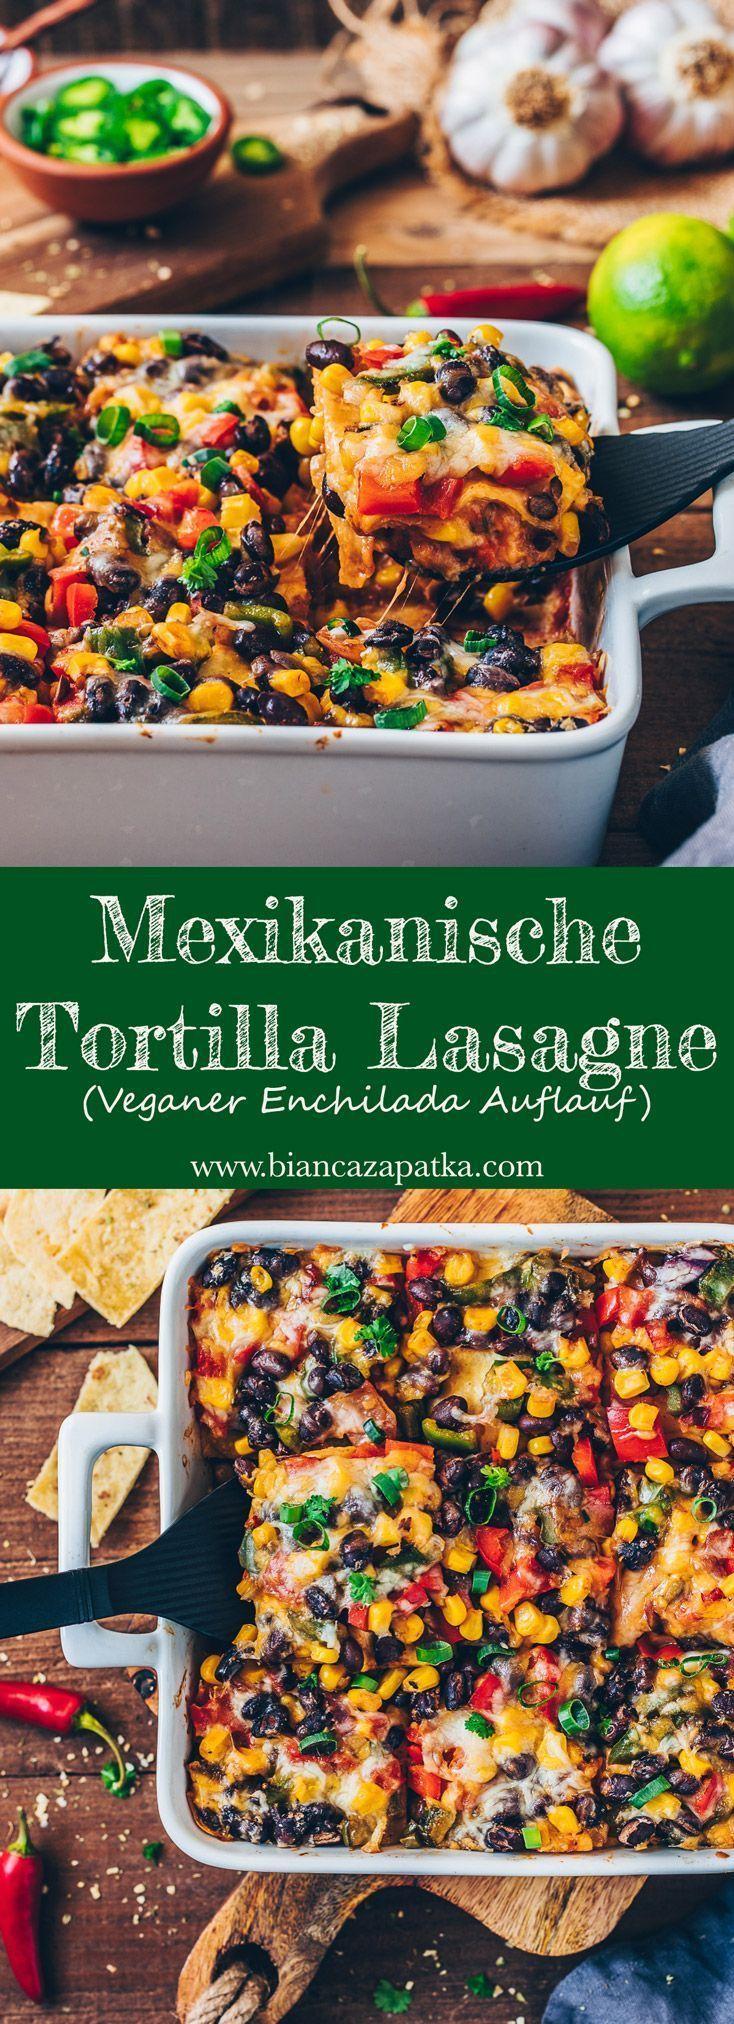 Mexikanische Tortilla Lasagne (vegan, einfach) - Bianca Zapatka | Rezepte